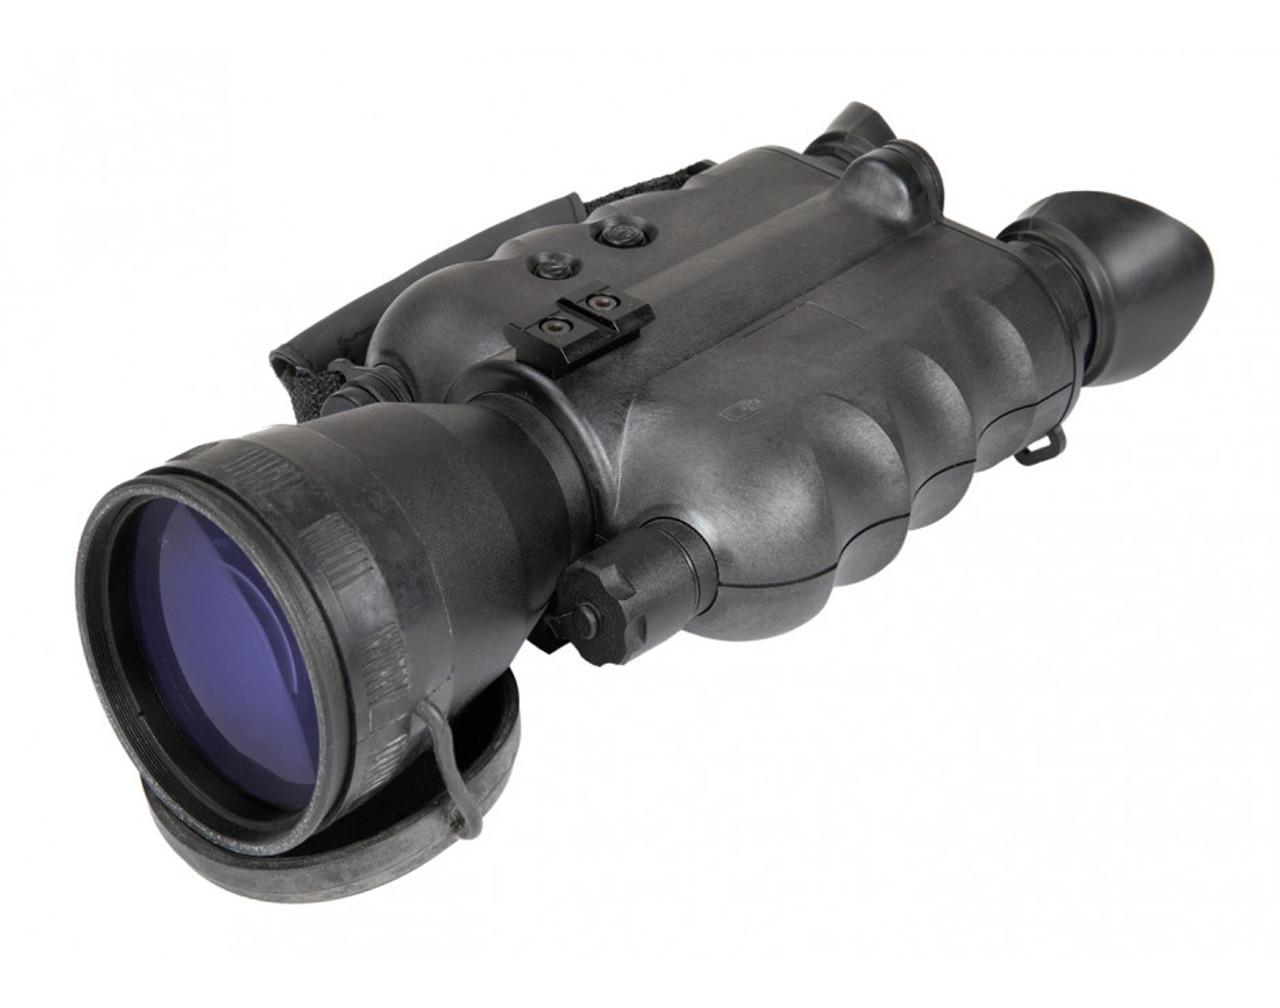 "AGM FoxBat-5 NW3 Night Vision Bi-Ocular 5x Gen 2+ ""White Phosphor Level 3"" with Sioux850 Long-Range Infrared Illuminator (AGM FOXBAT-5 NW3)"